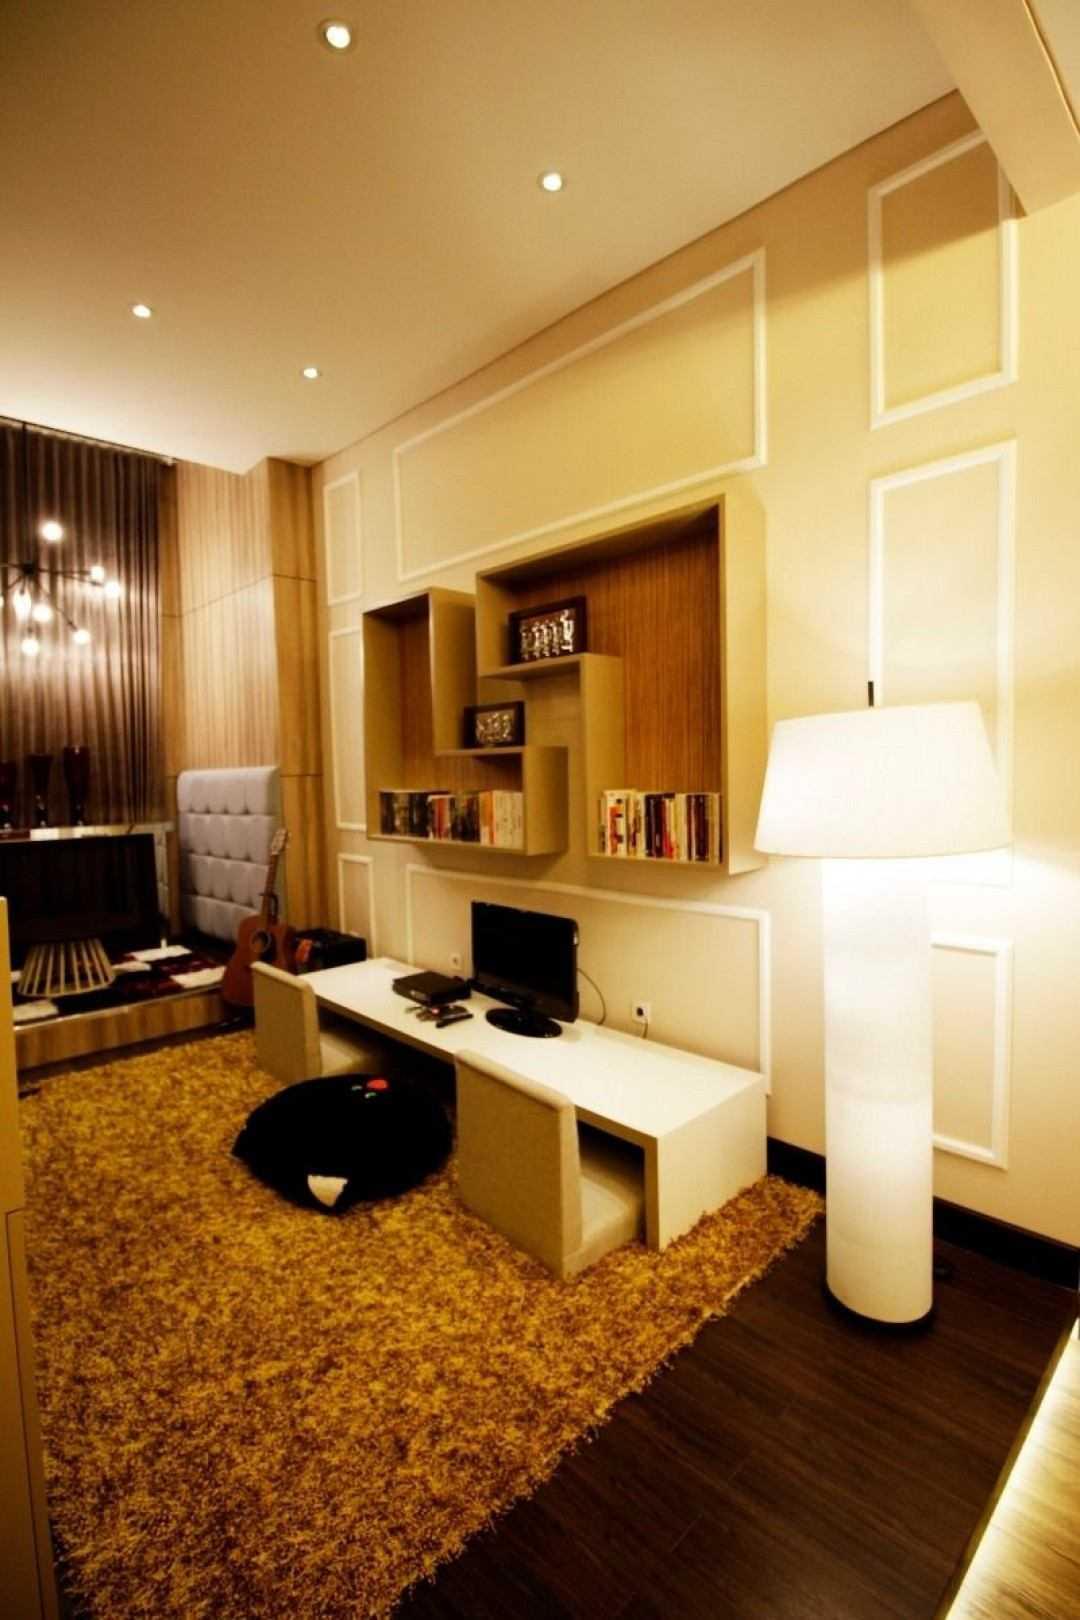 Kottagaris Interior Design Consultant Mr L Residence Surabaya, Kota Sby, Jawa Timur, Indonesia Surabaya, Kota Sby, Jawa Timur, Indonesia Dining Room Klasik 54612